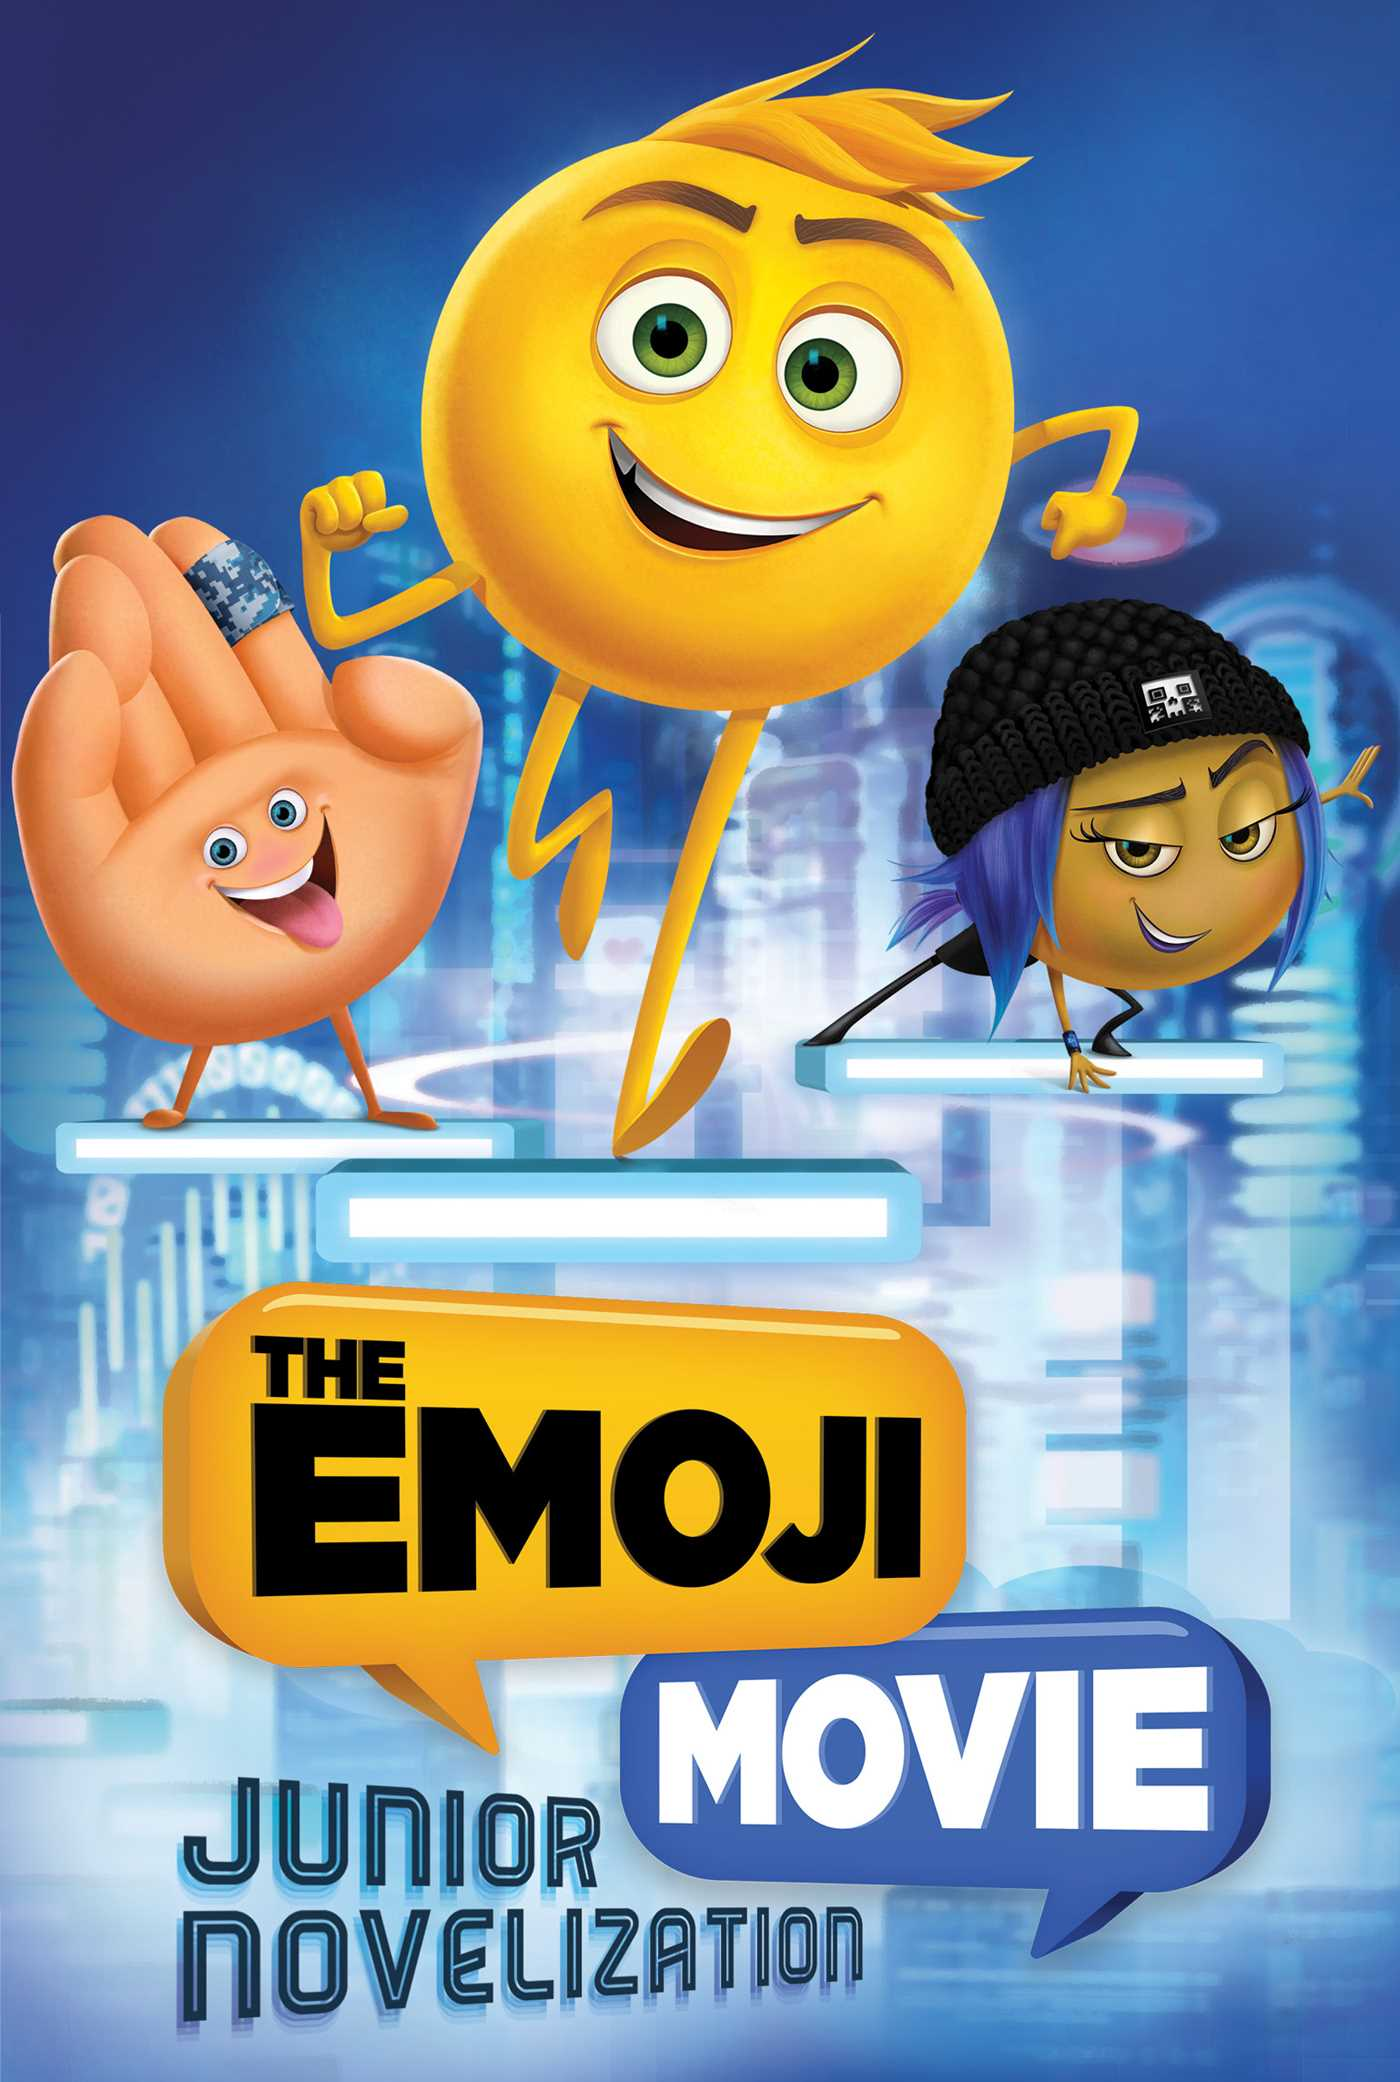 The Emoji Movie 2017 Direct Link Latest Movies